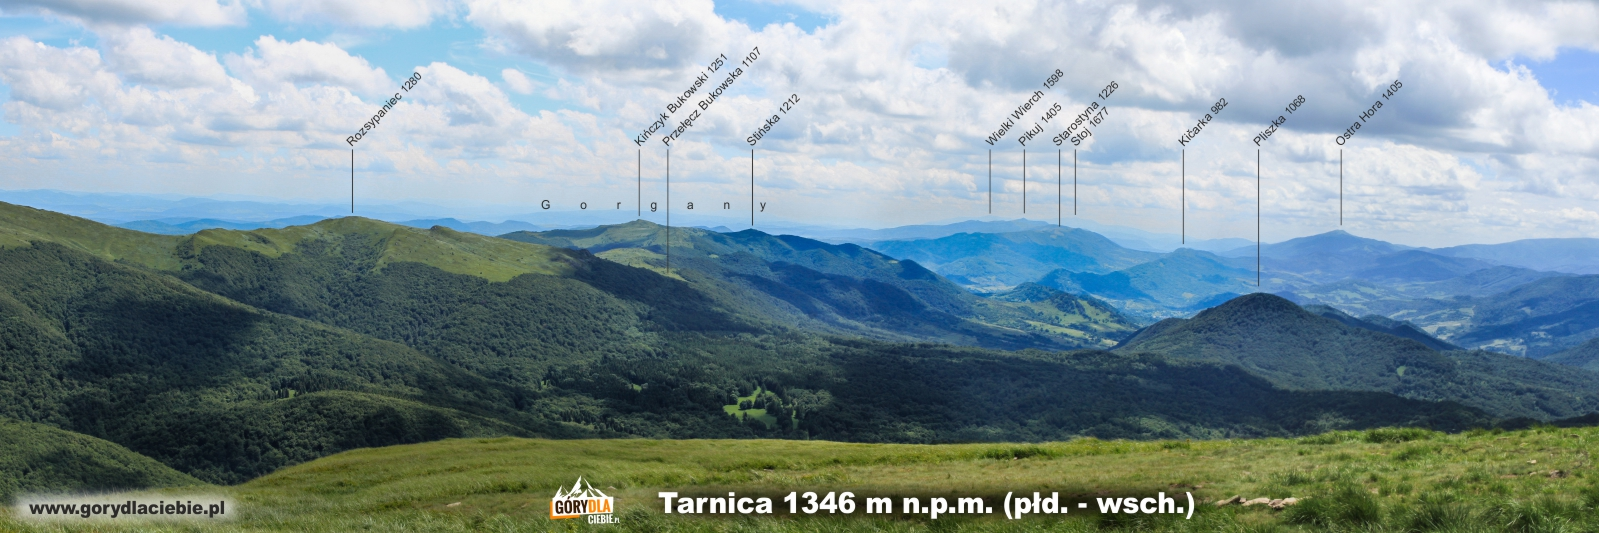 Panorama z Tarnicy na płd.-wsch. (opis)